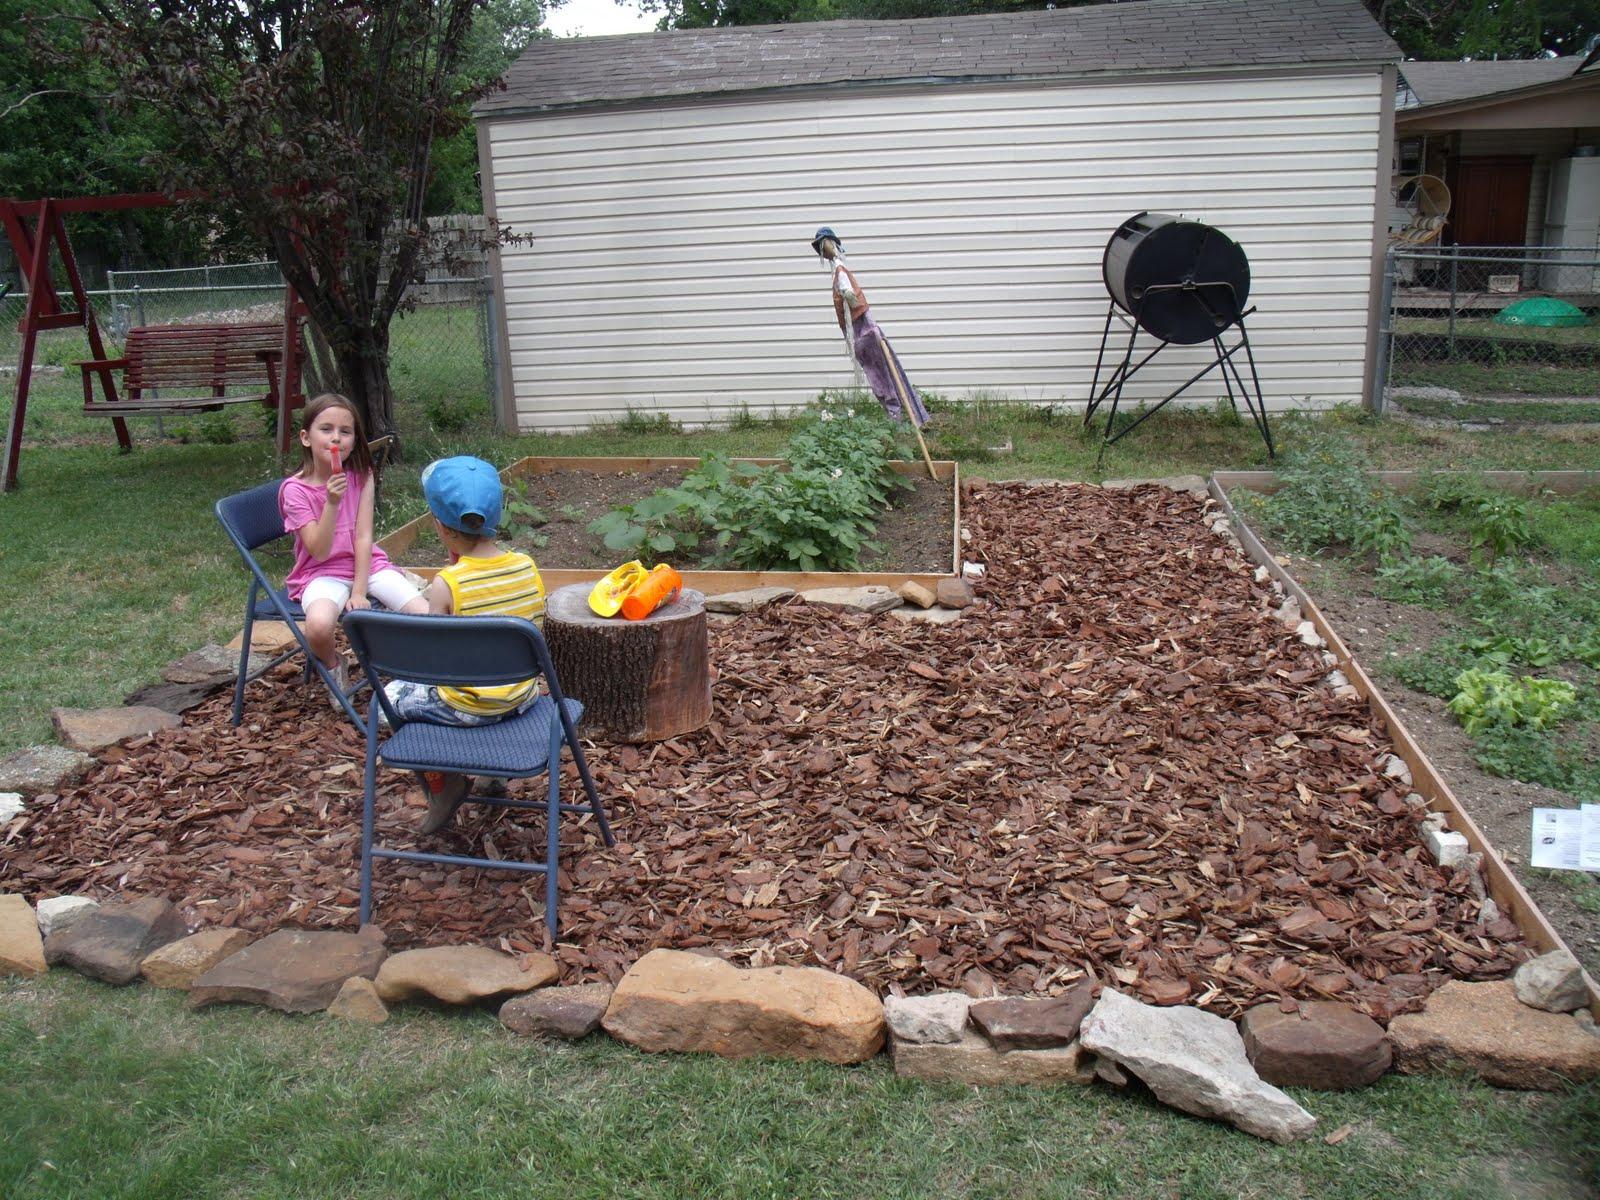 Backyard makeover on a budget - One Mama's Daily Drama on Backyard Patio Makeover id=26740